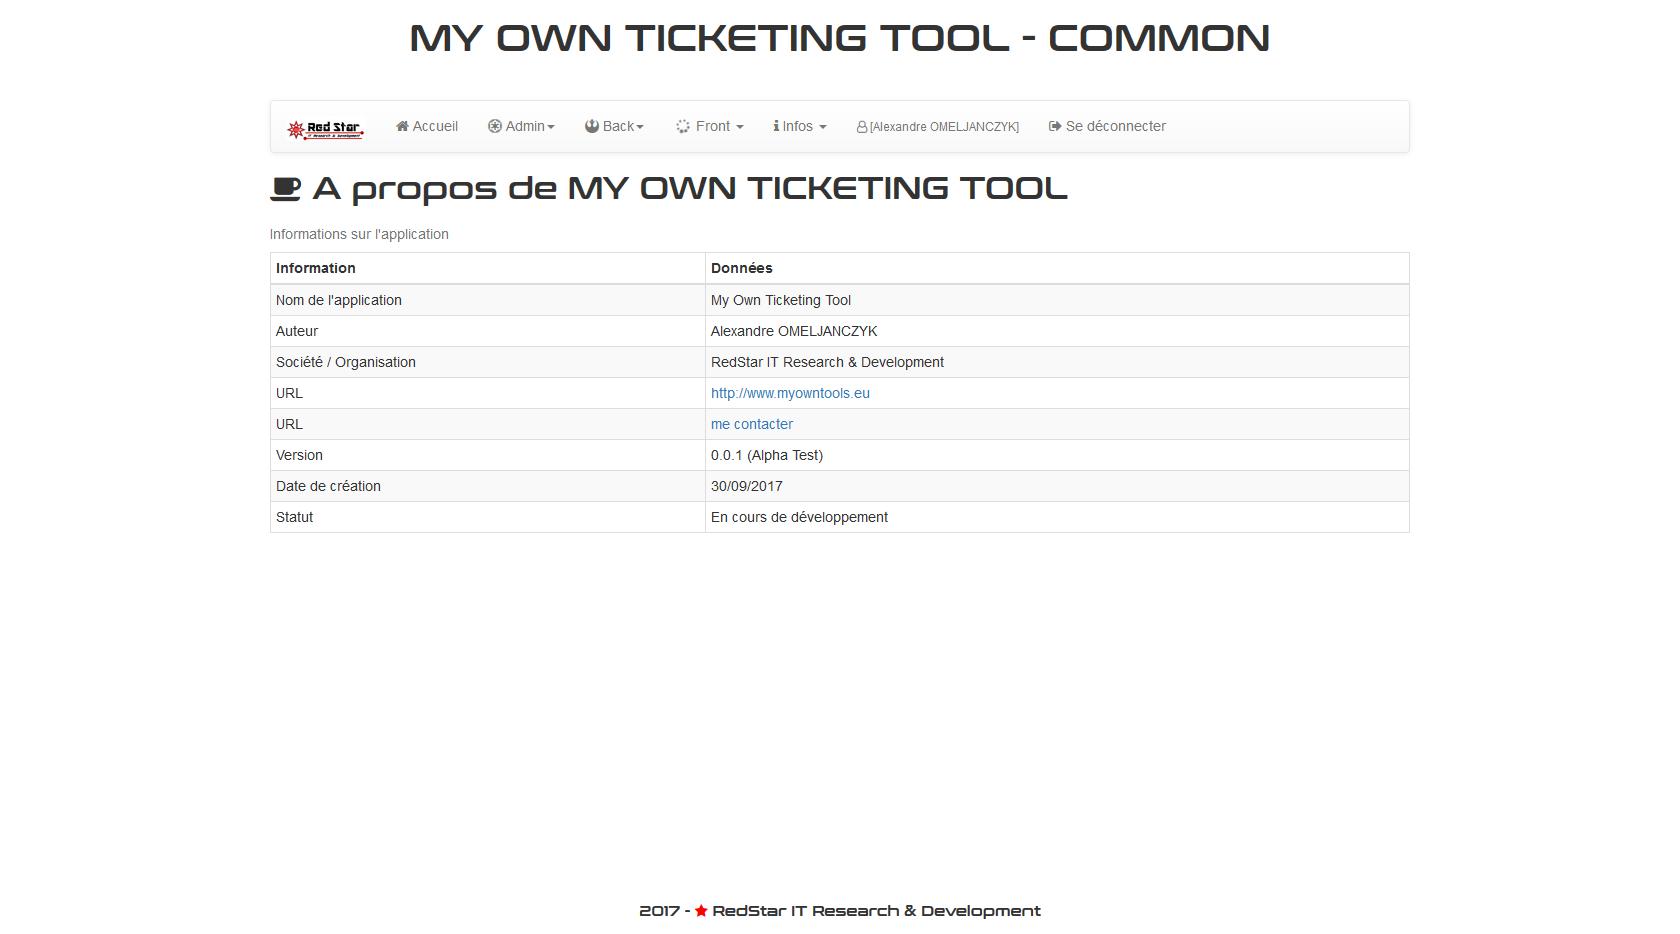 My Own Ticketing Tool #1